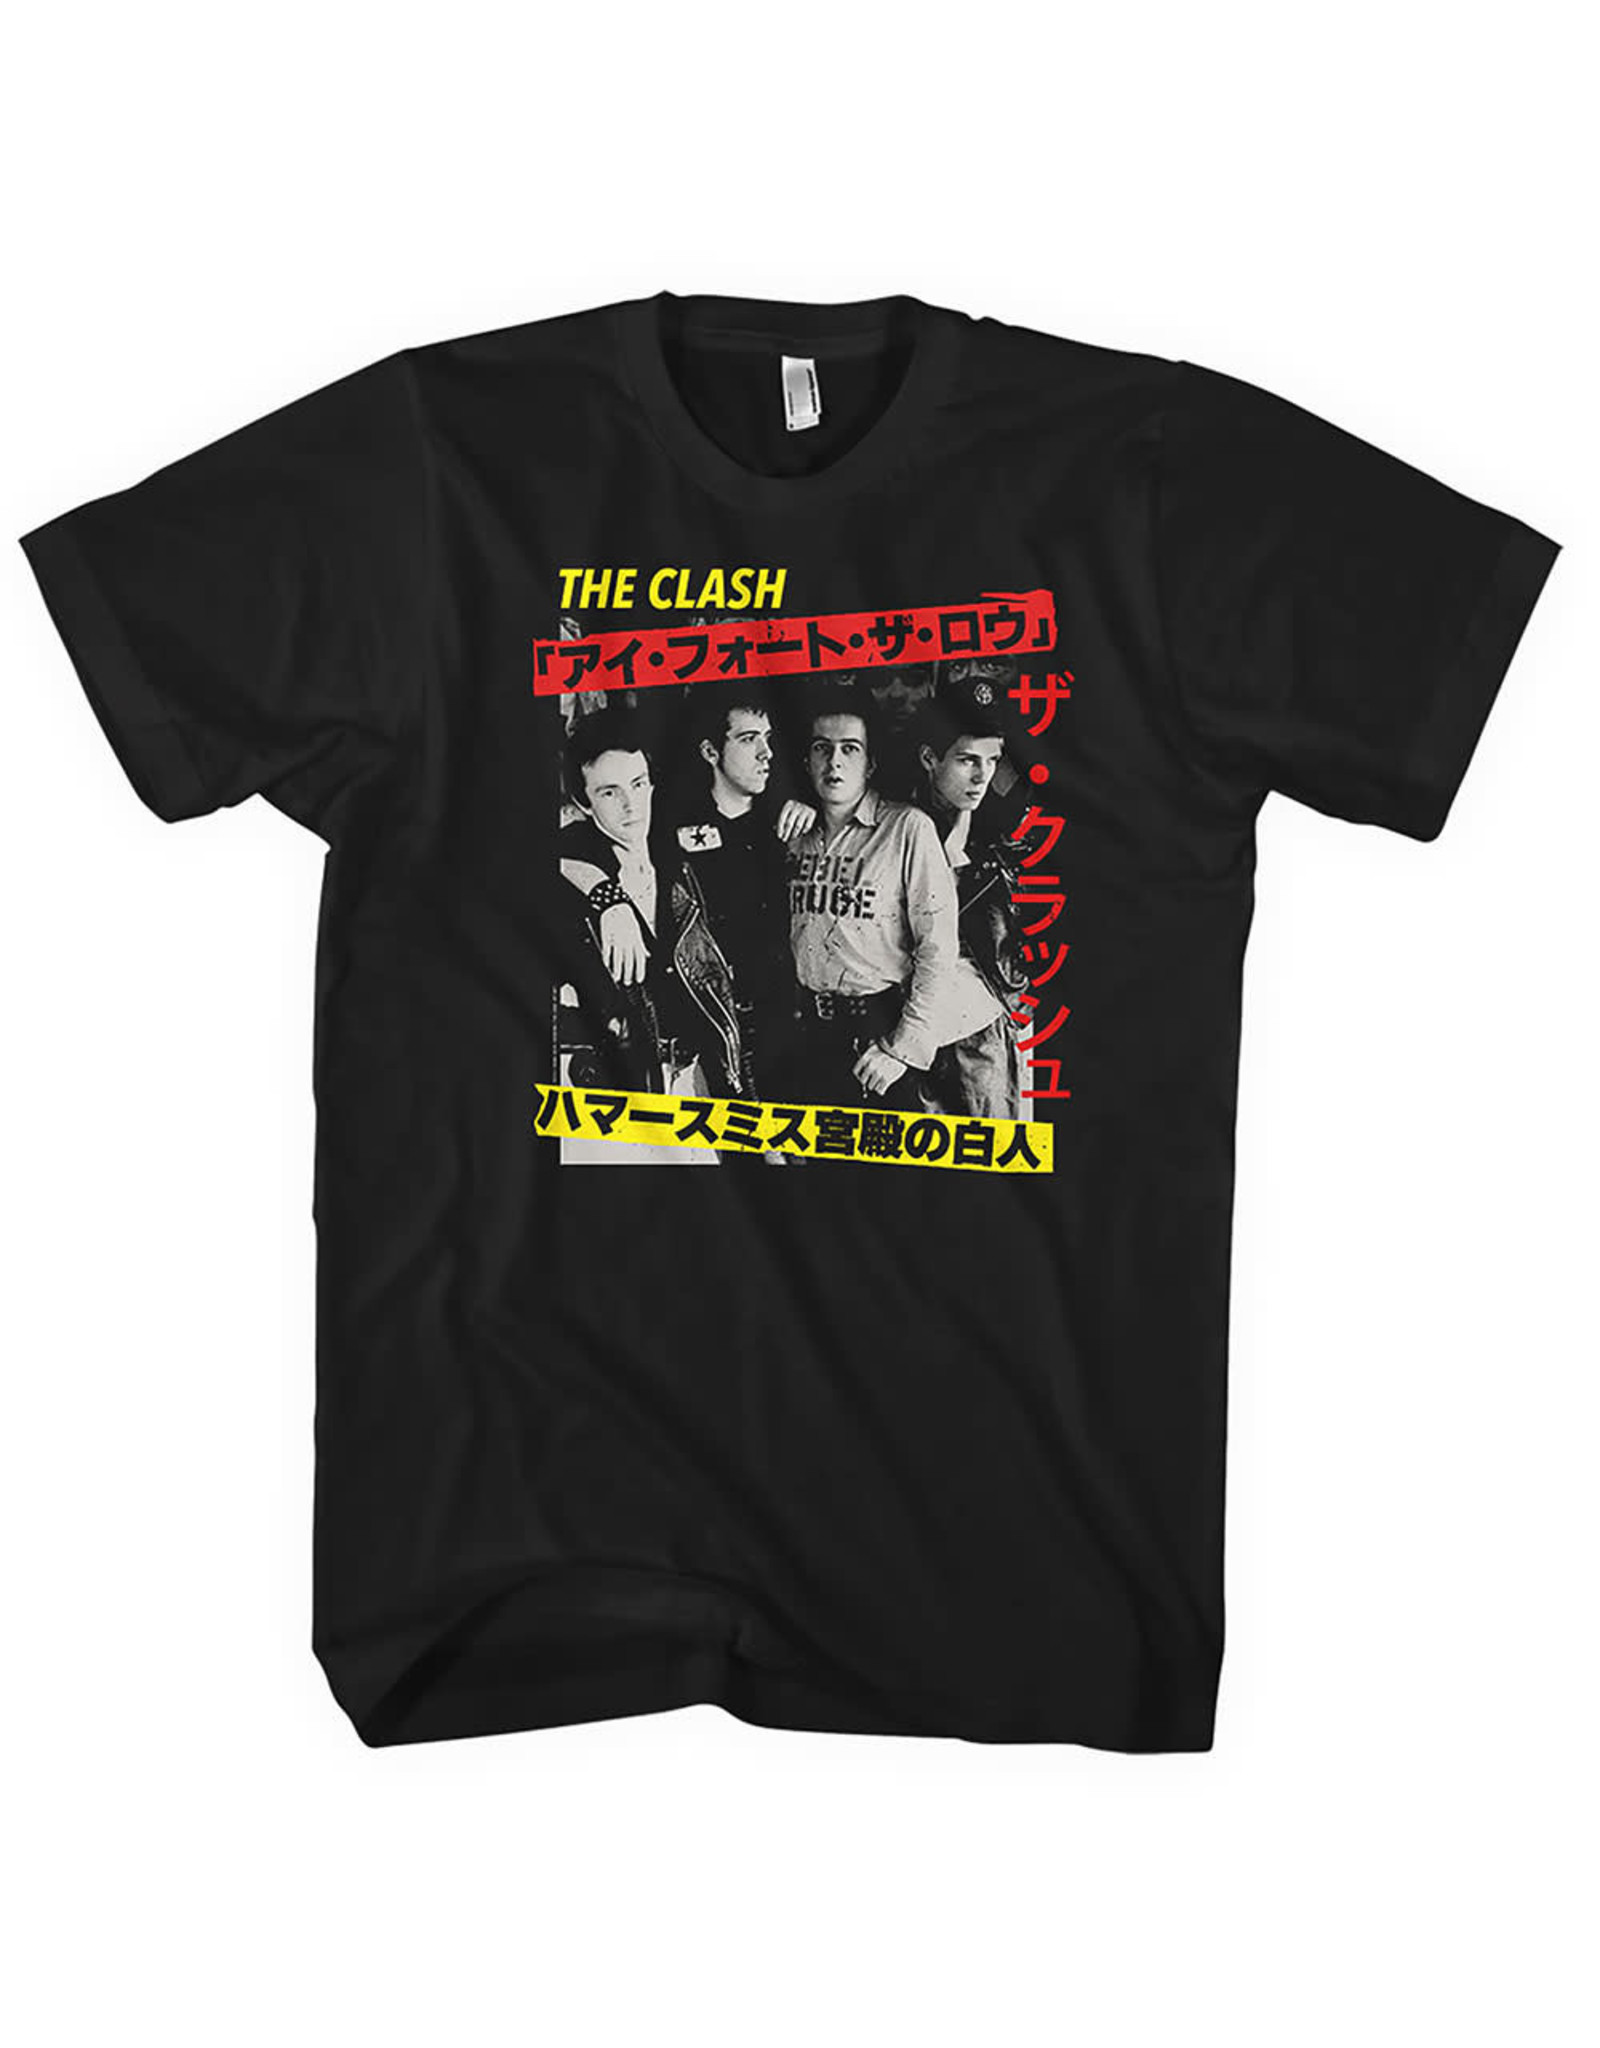 The Clash / Japan Tee